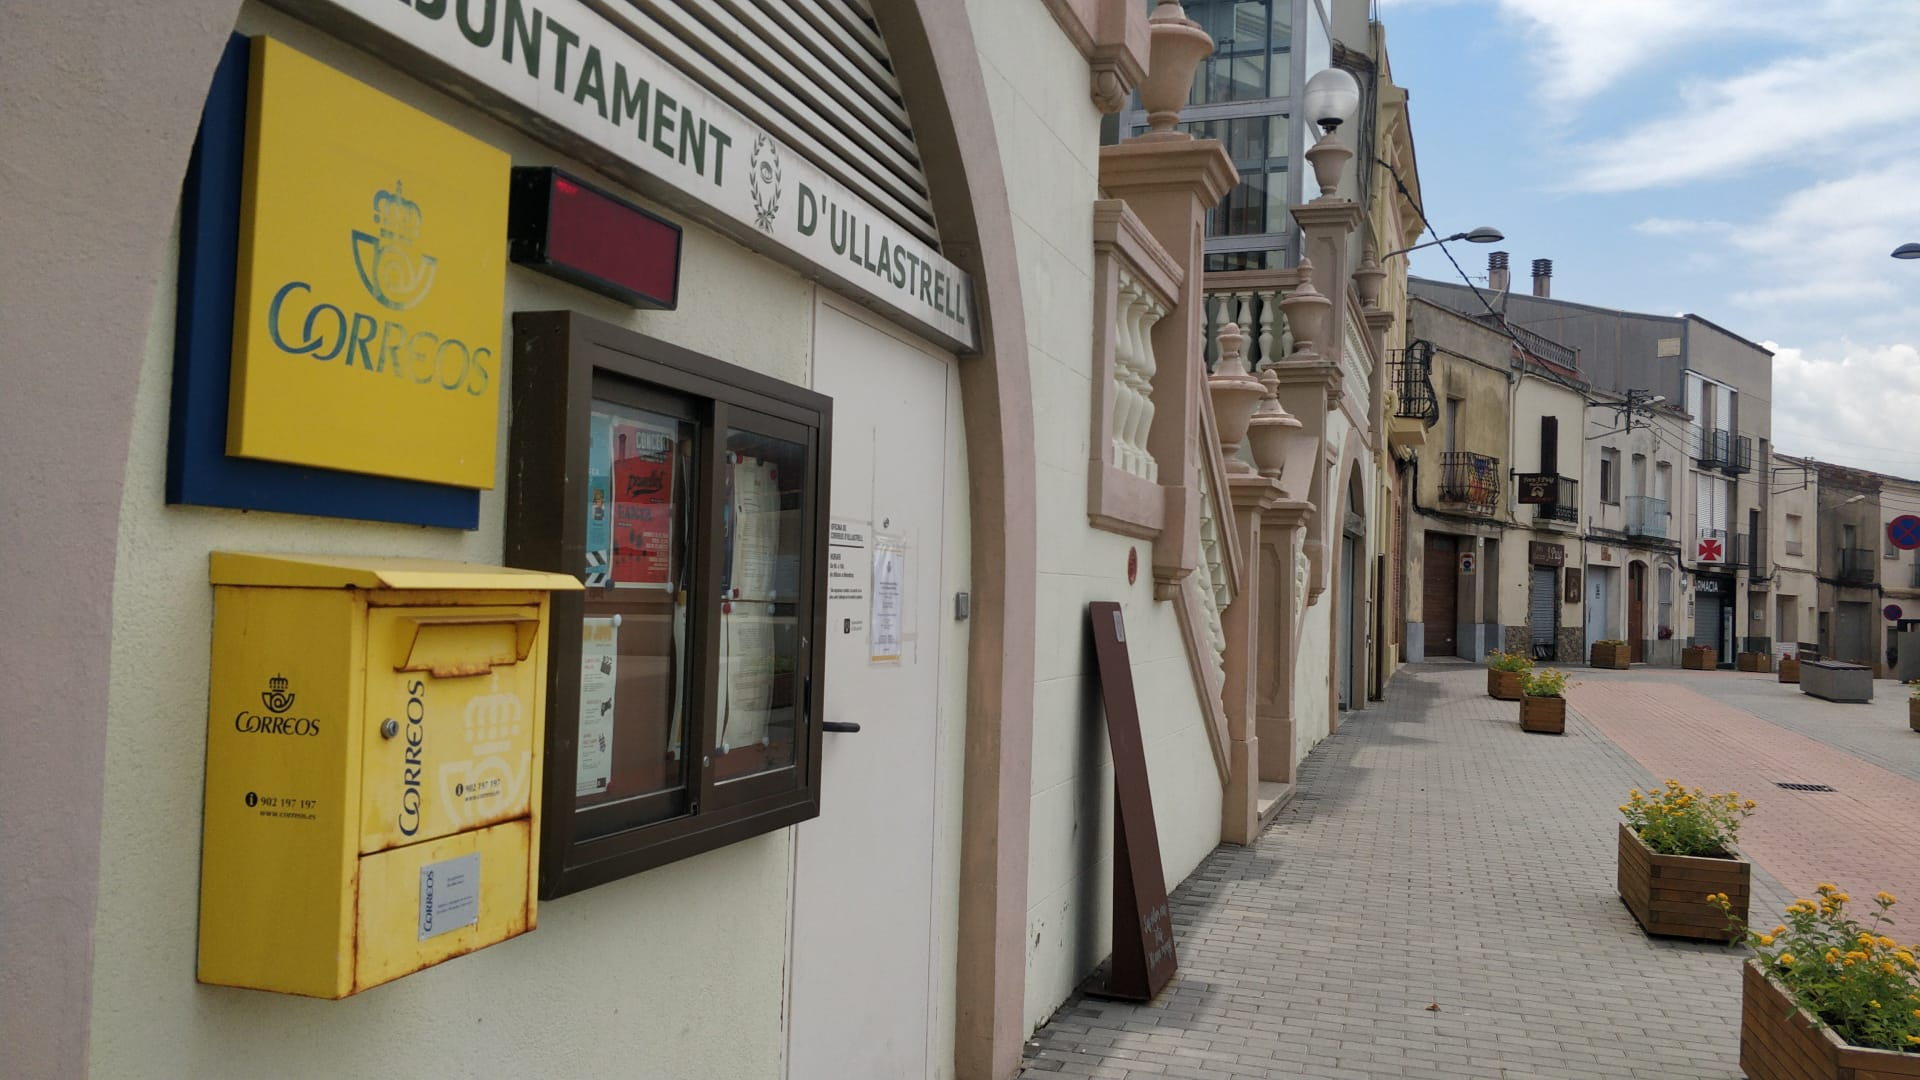 Oficina de correus a Ullastrell | Aj. Ullastrell